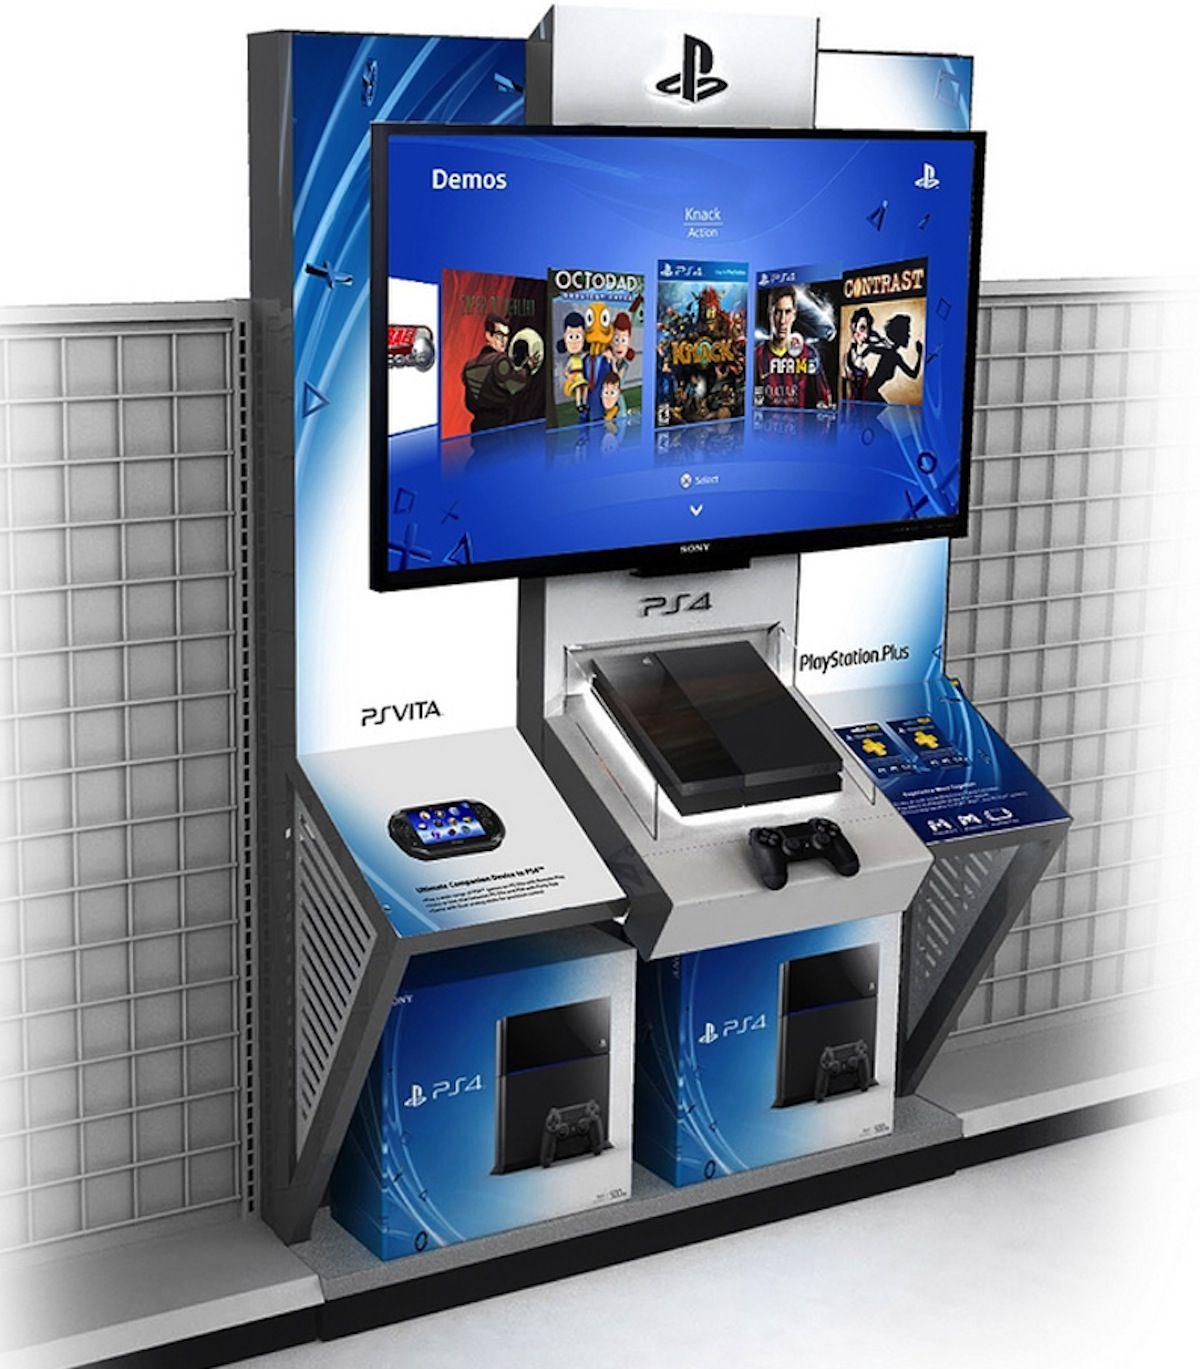 Playstation 4 Kiosks Spreading Throughout American Retailers Today Kiosk Design Retail Design Playstation